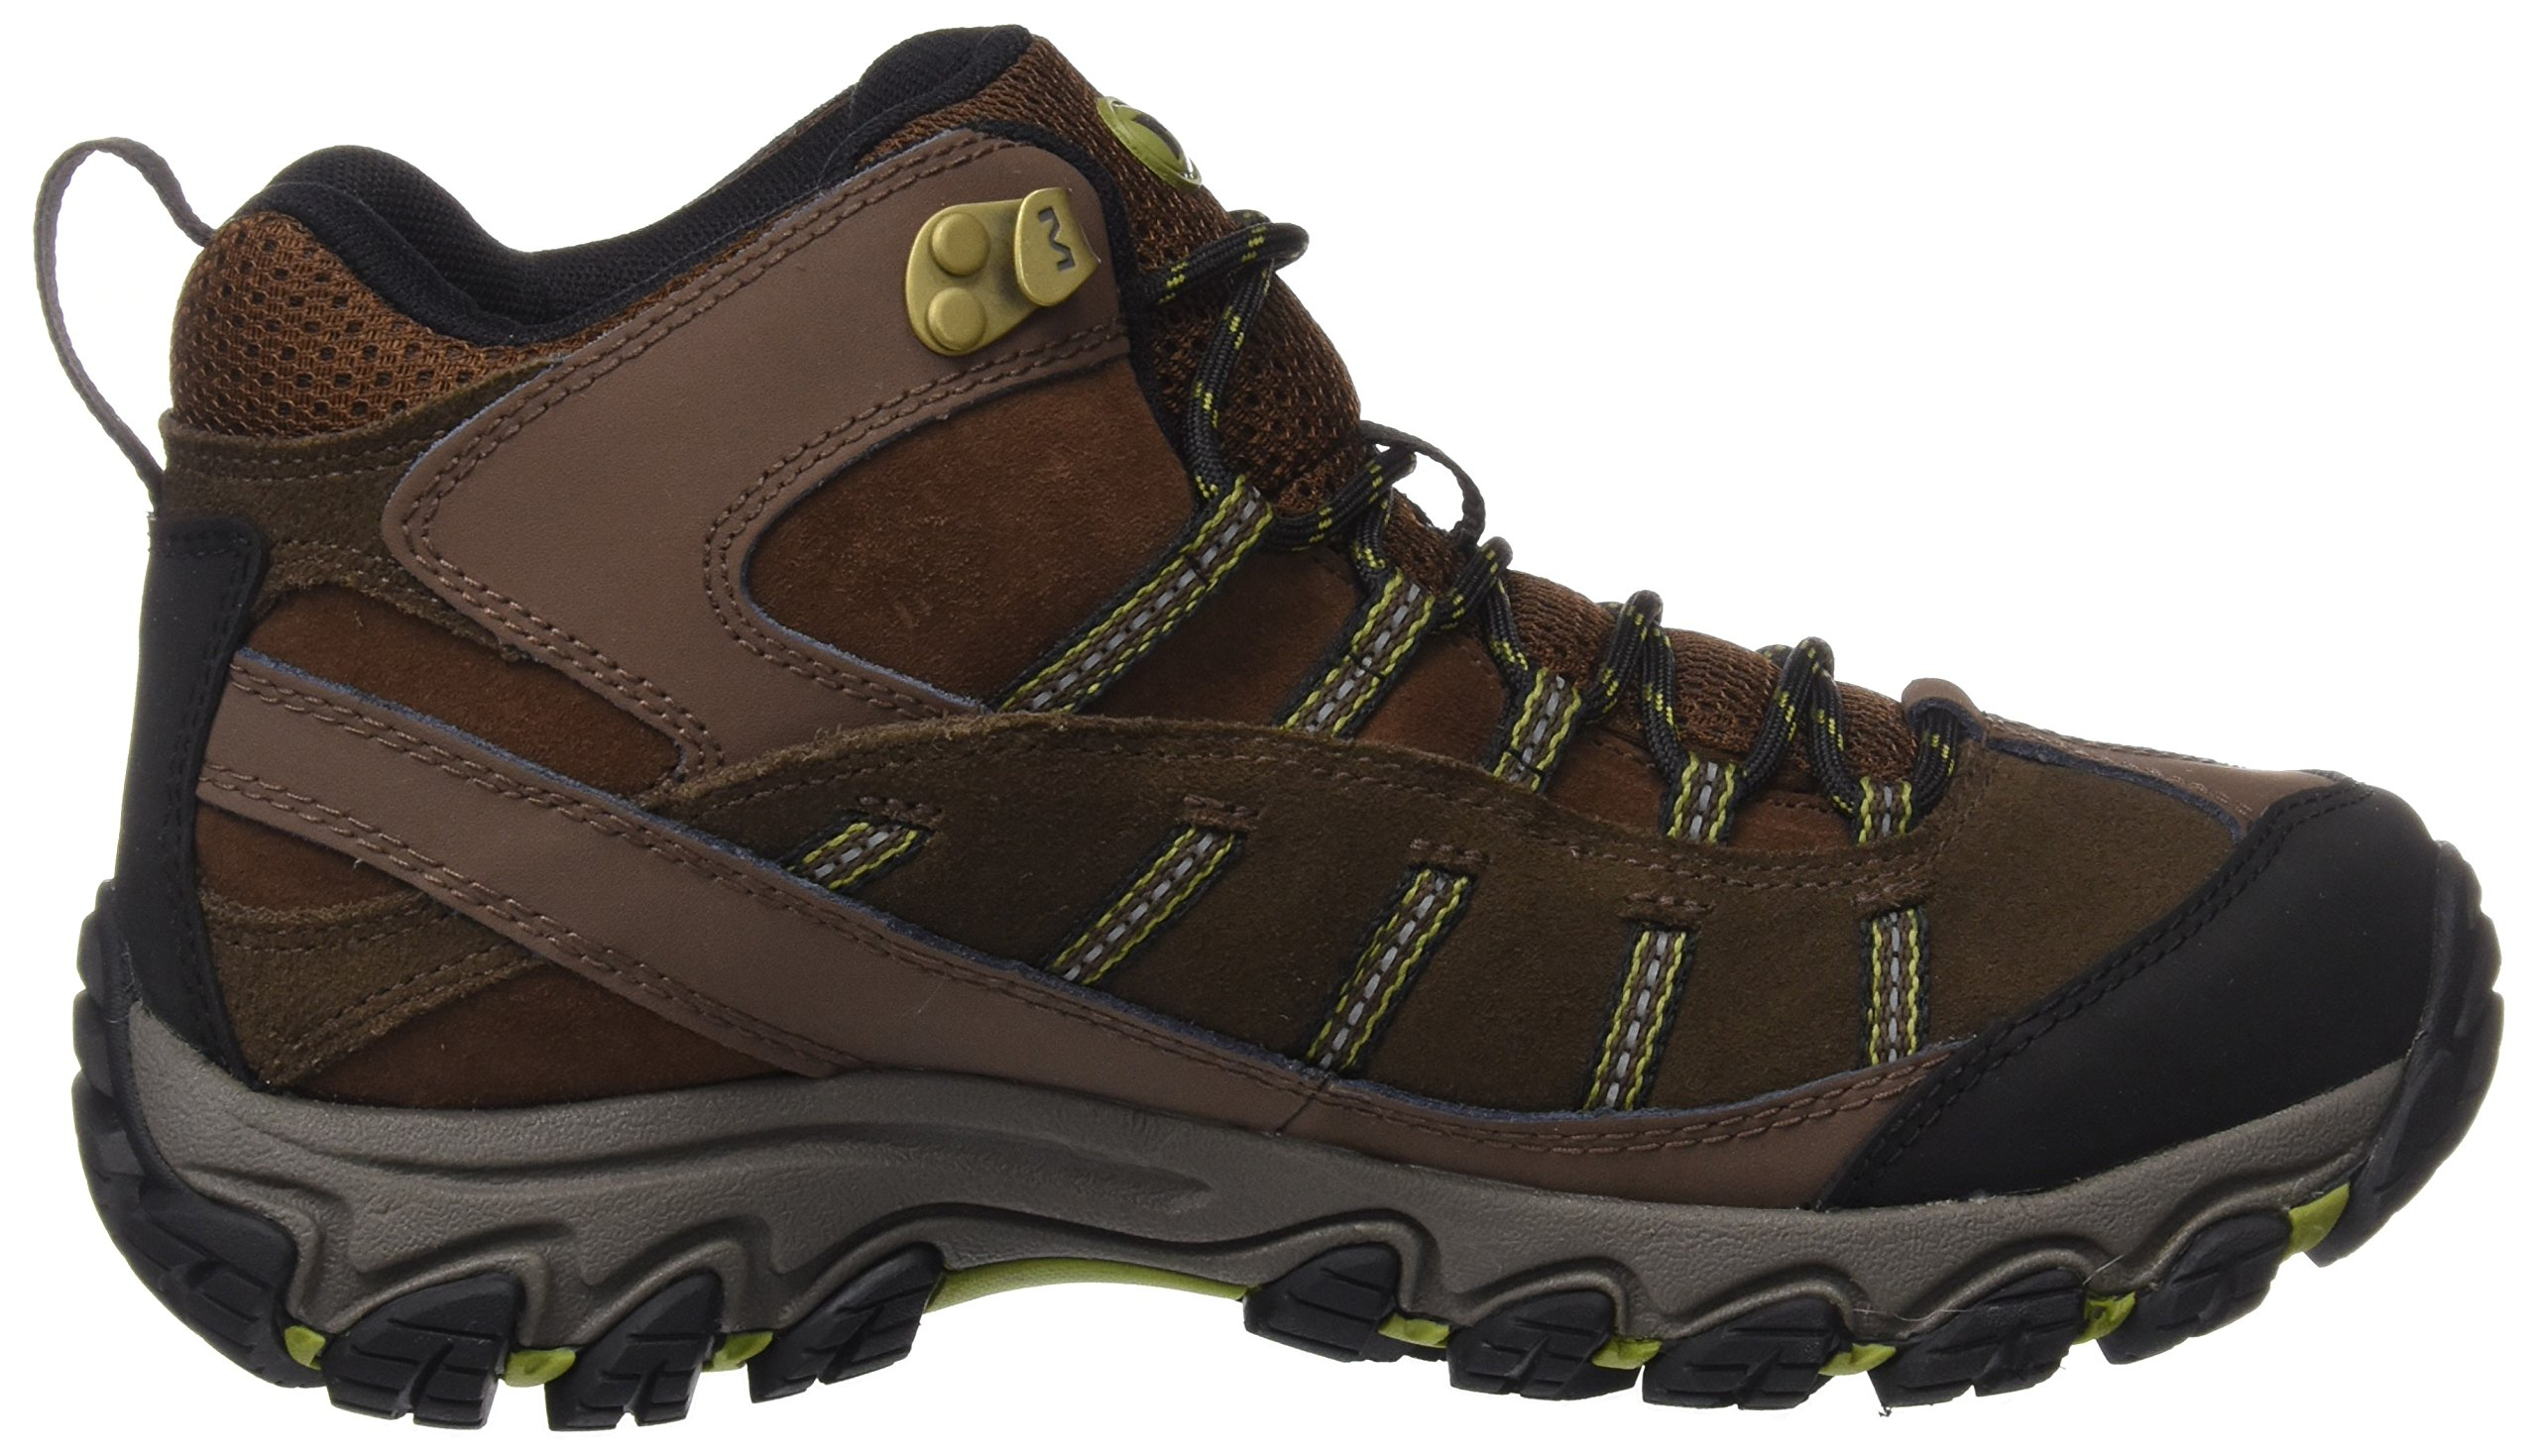 81Qijl9MSwL - Merrell Men's Terramorph Mid Waterproof High Rise Hiking Boots